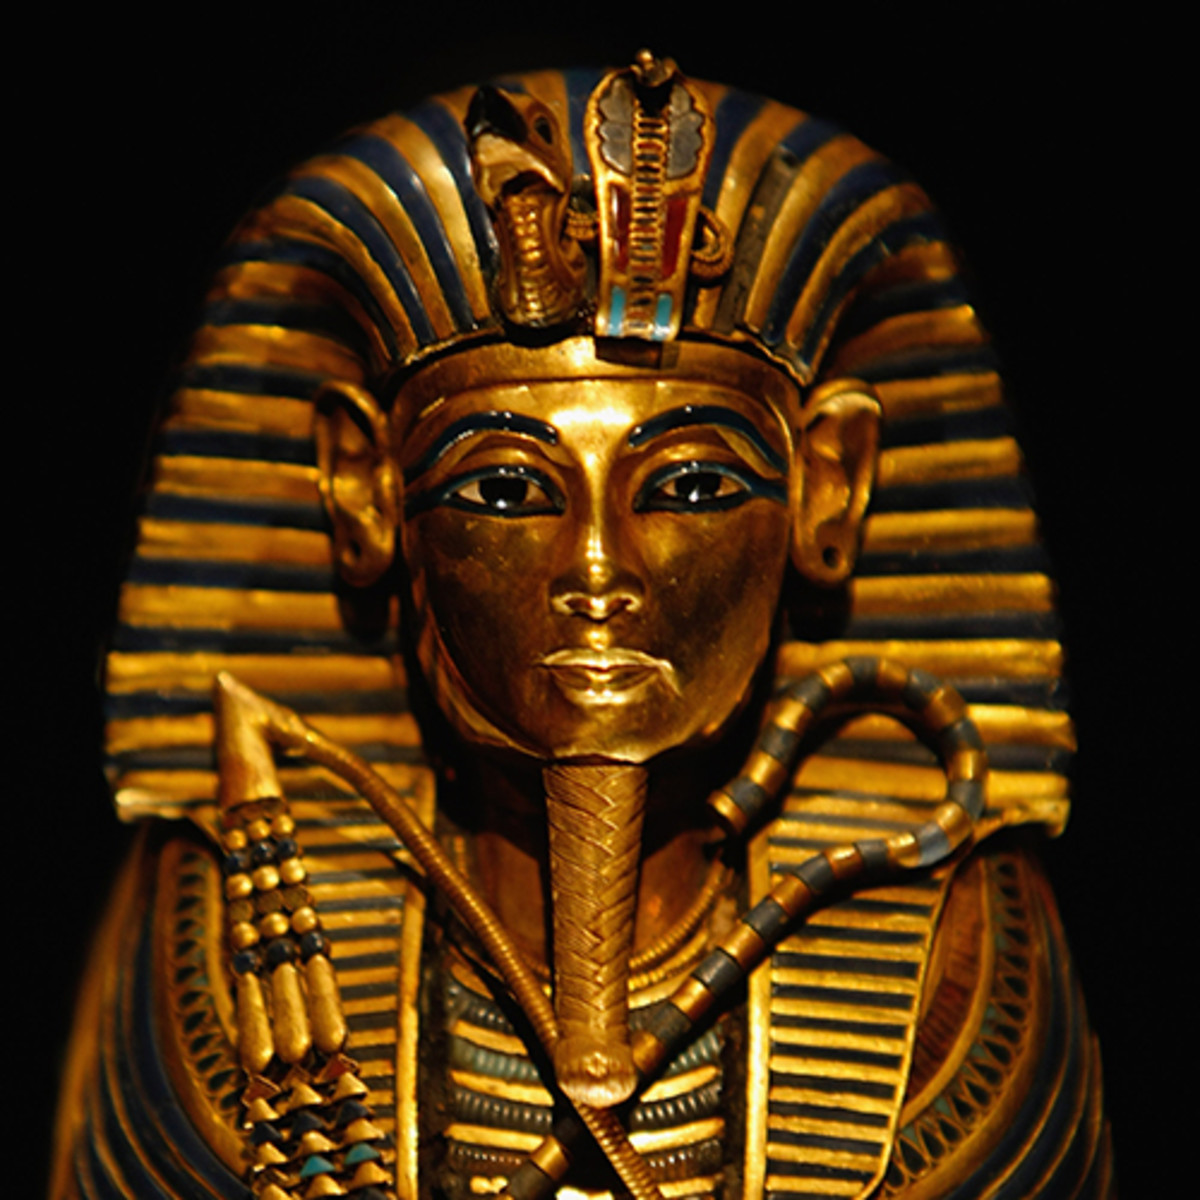 King Tut - Tomb, Facts & Mummy - Biography